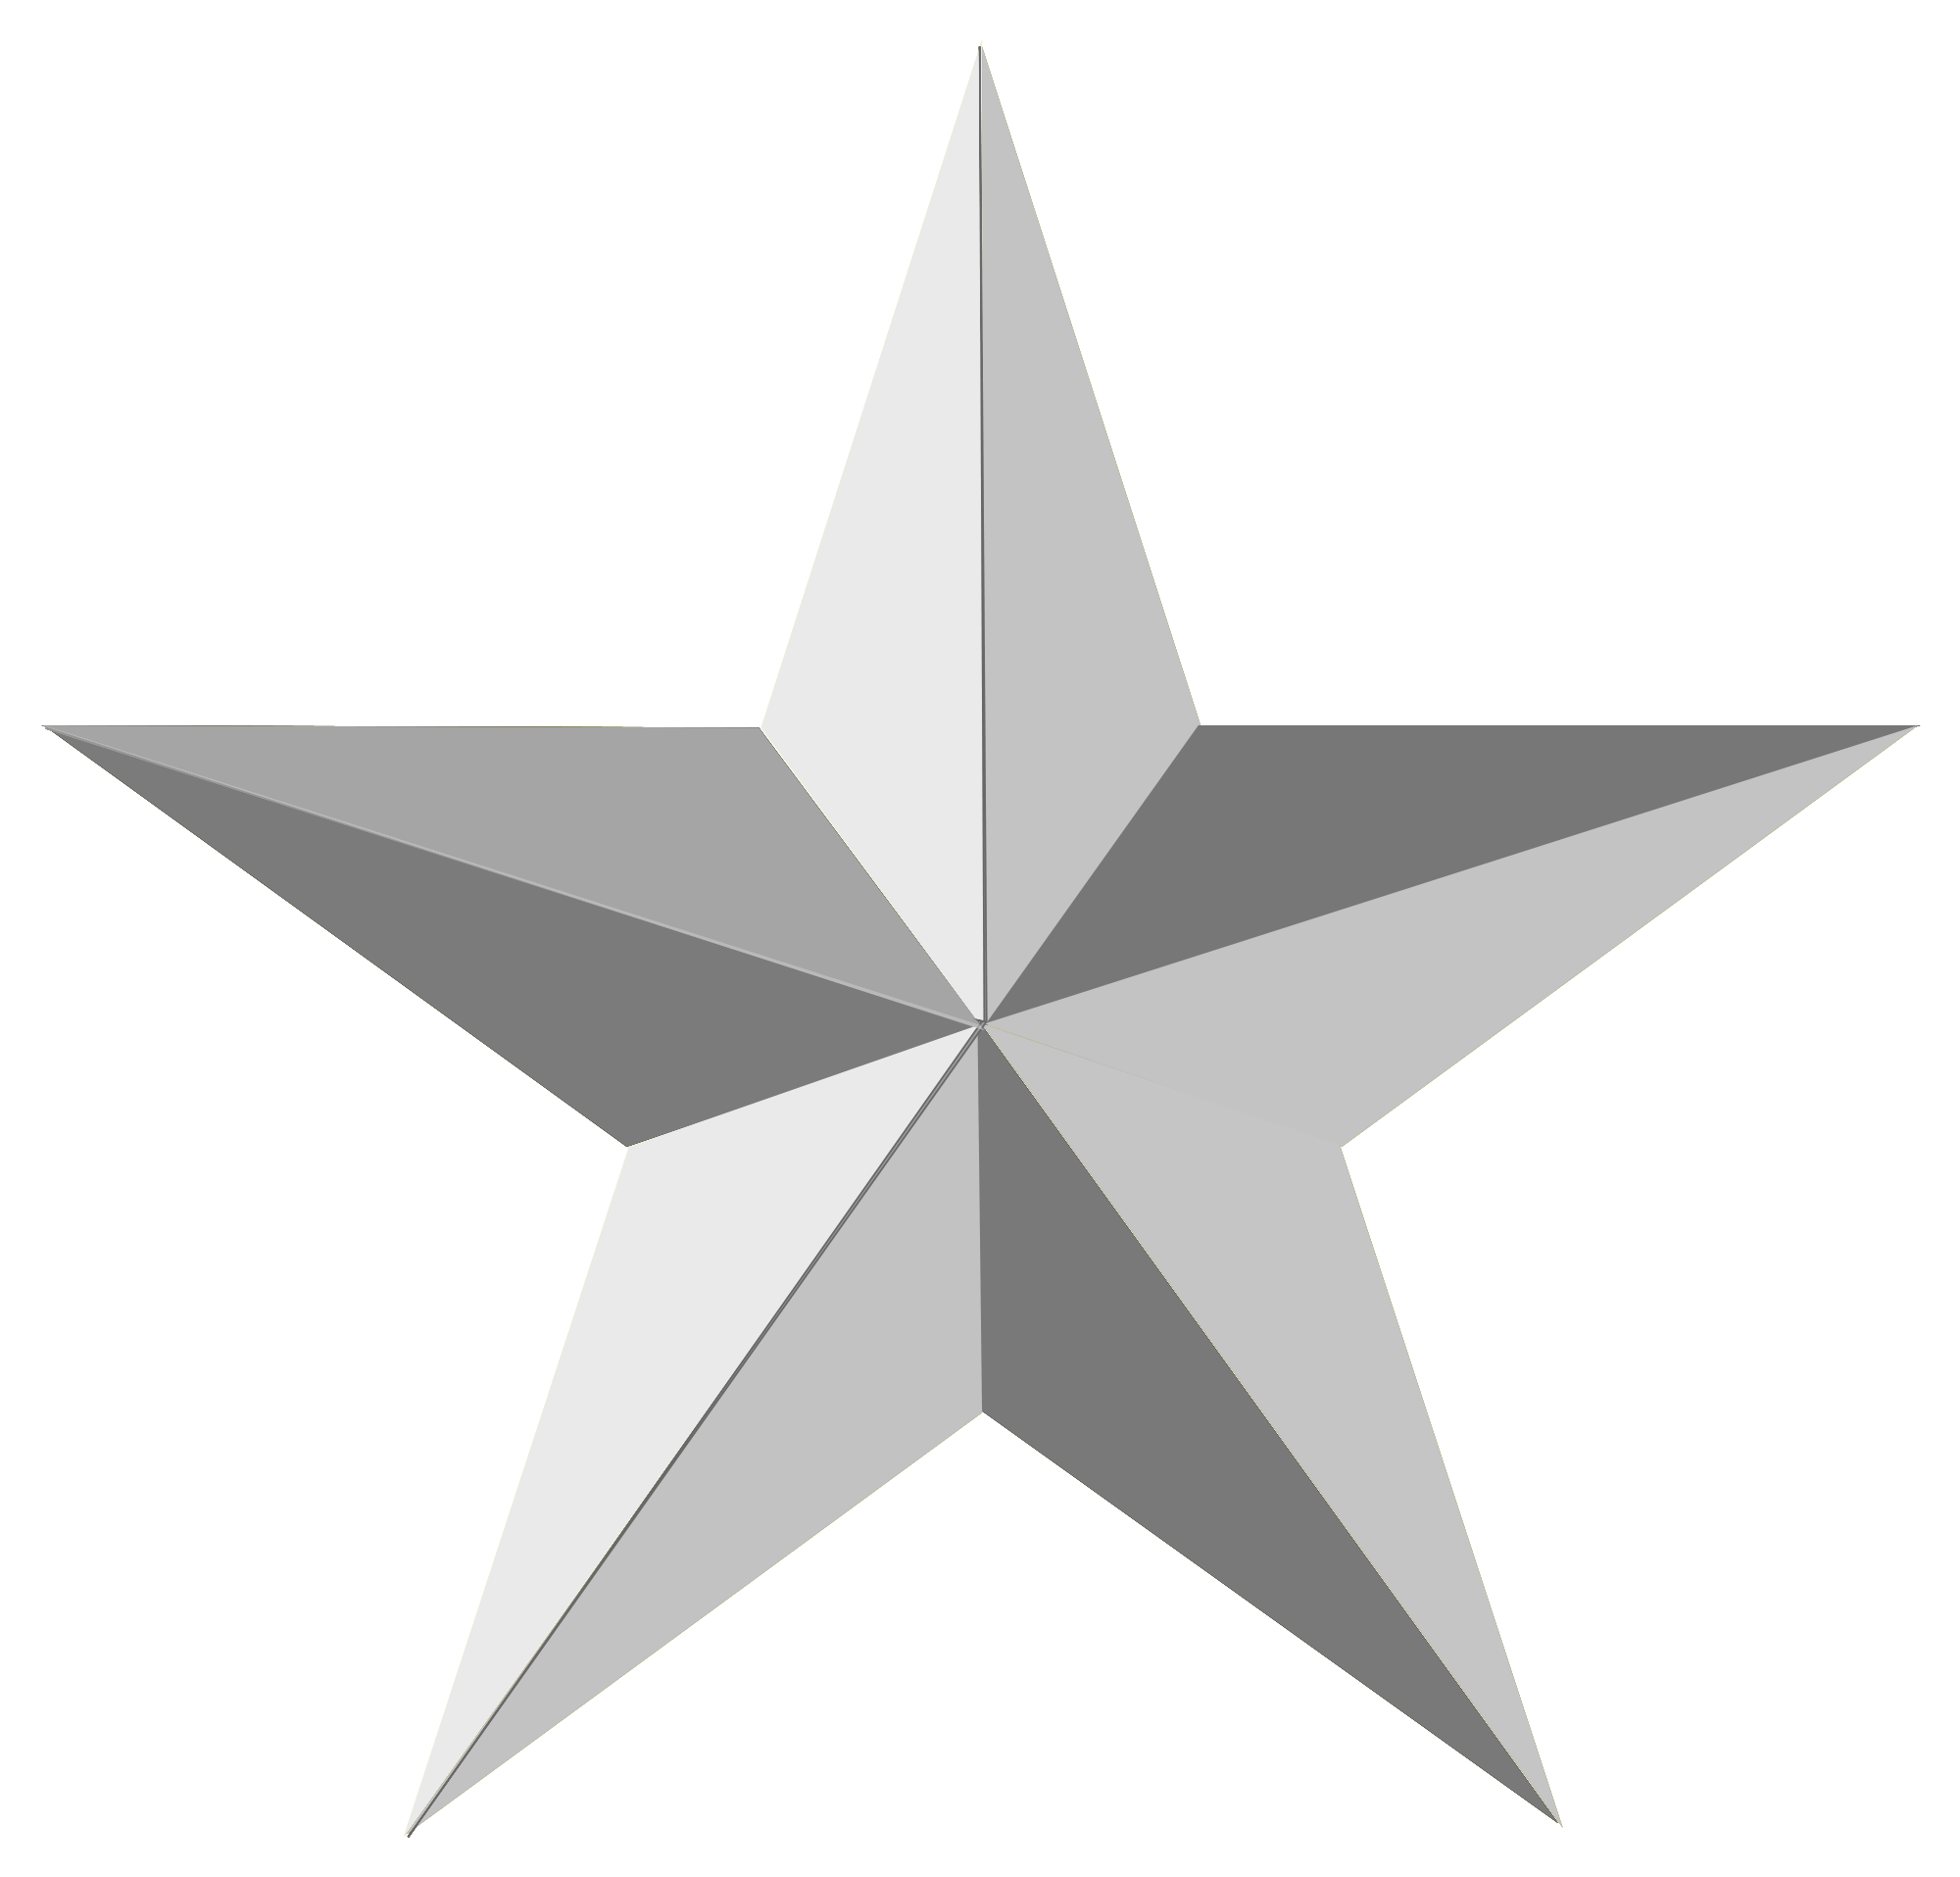 Silver Star Silver Stars Stars Star Light Star Bright